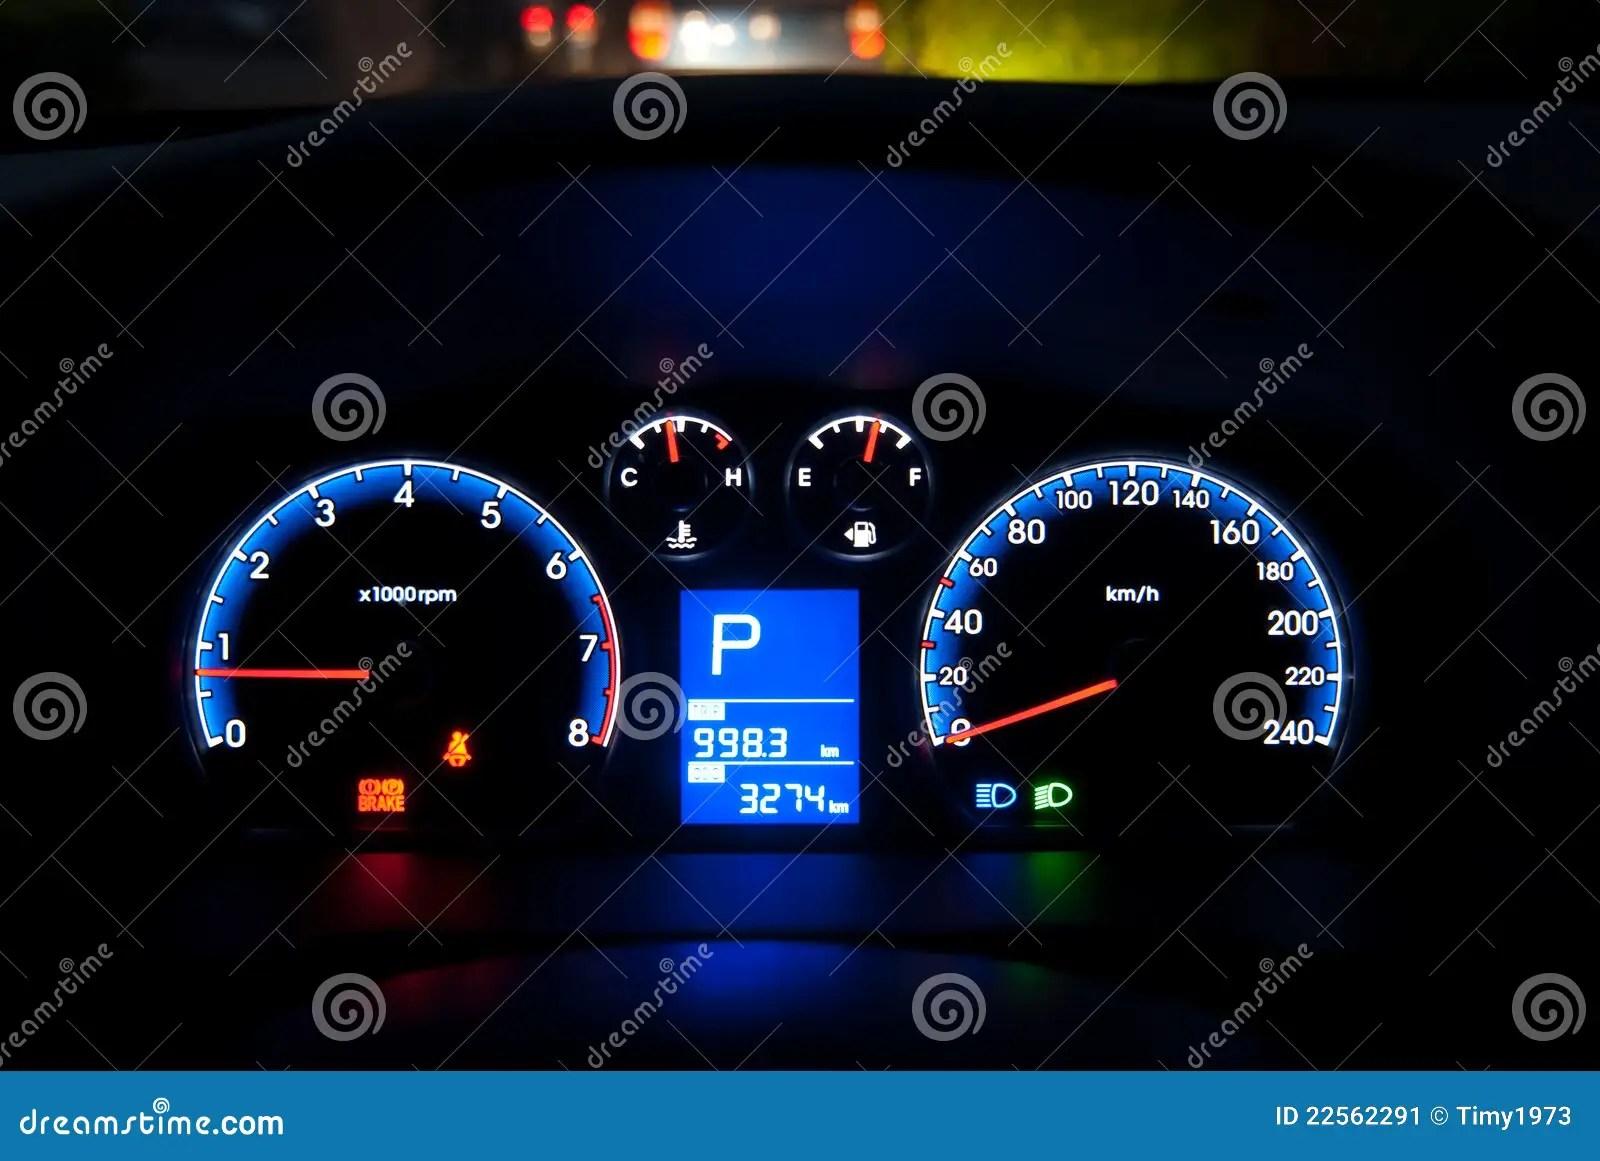 Car Instrument Panel Stock Image